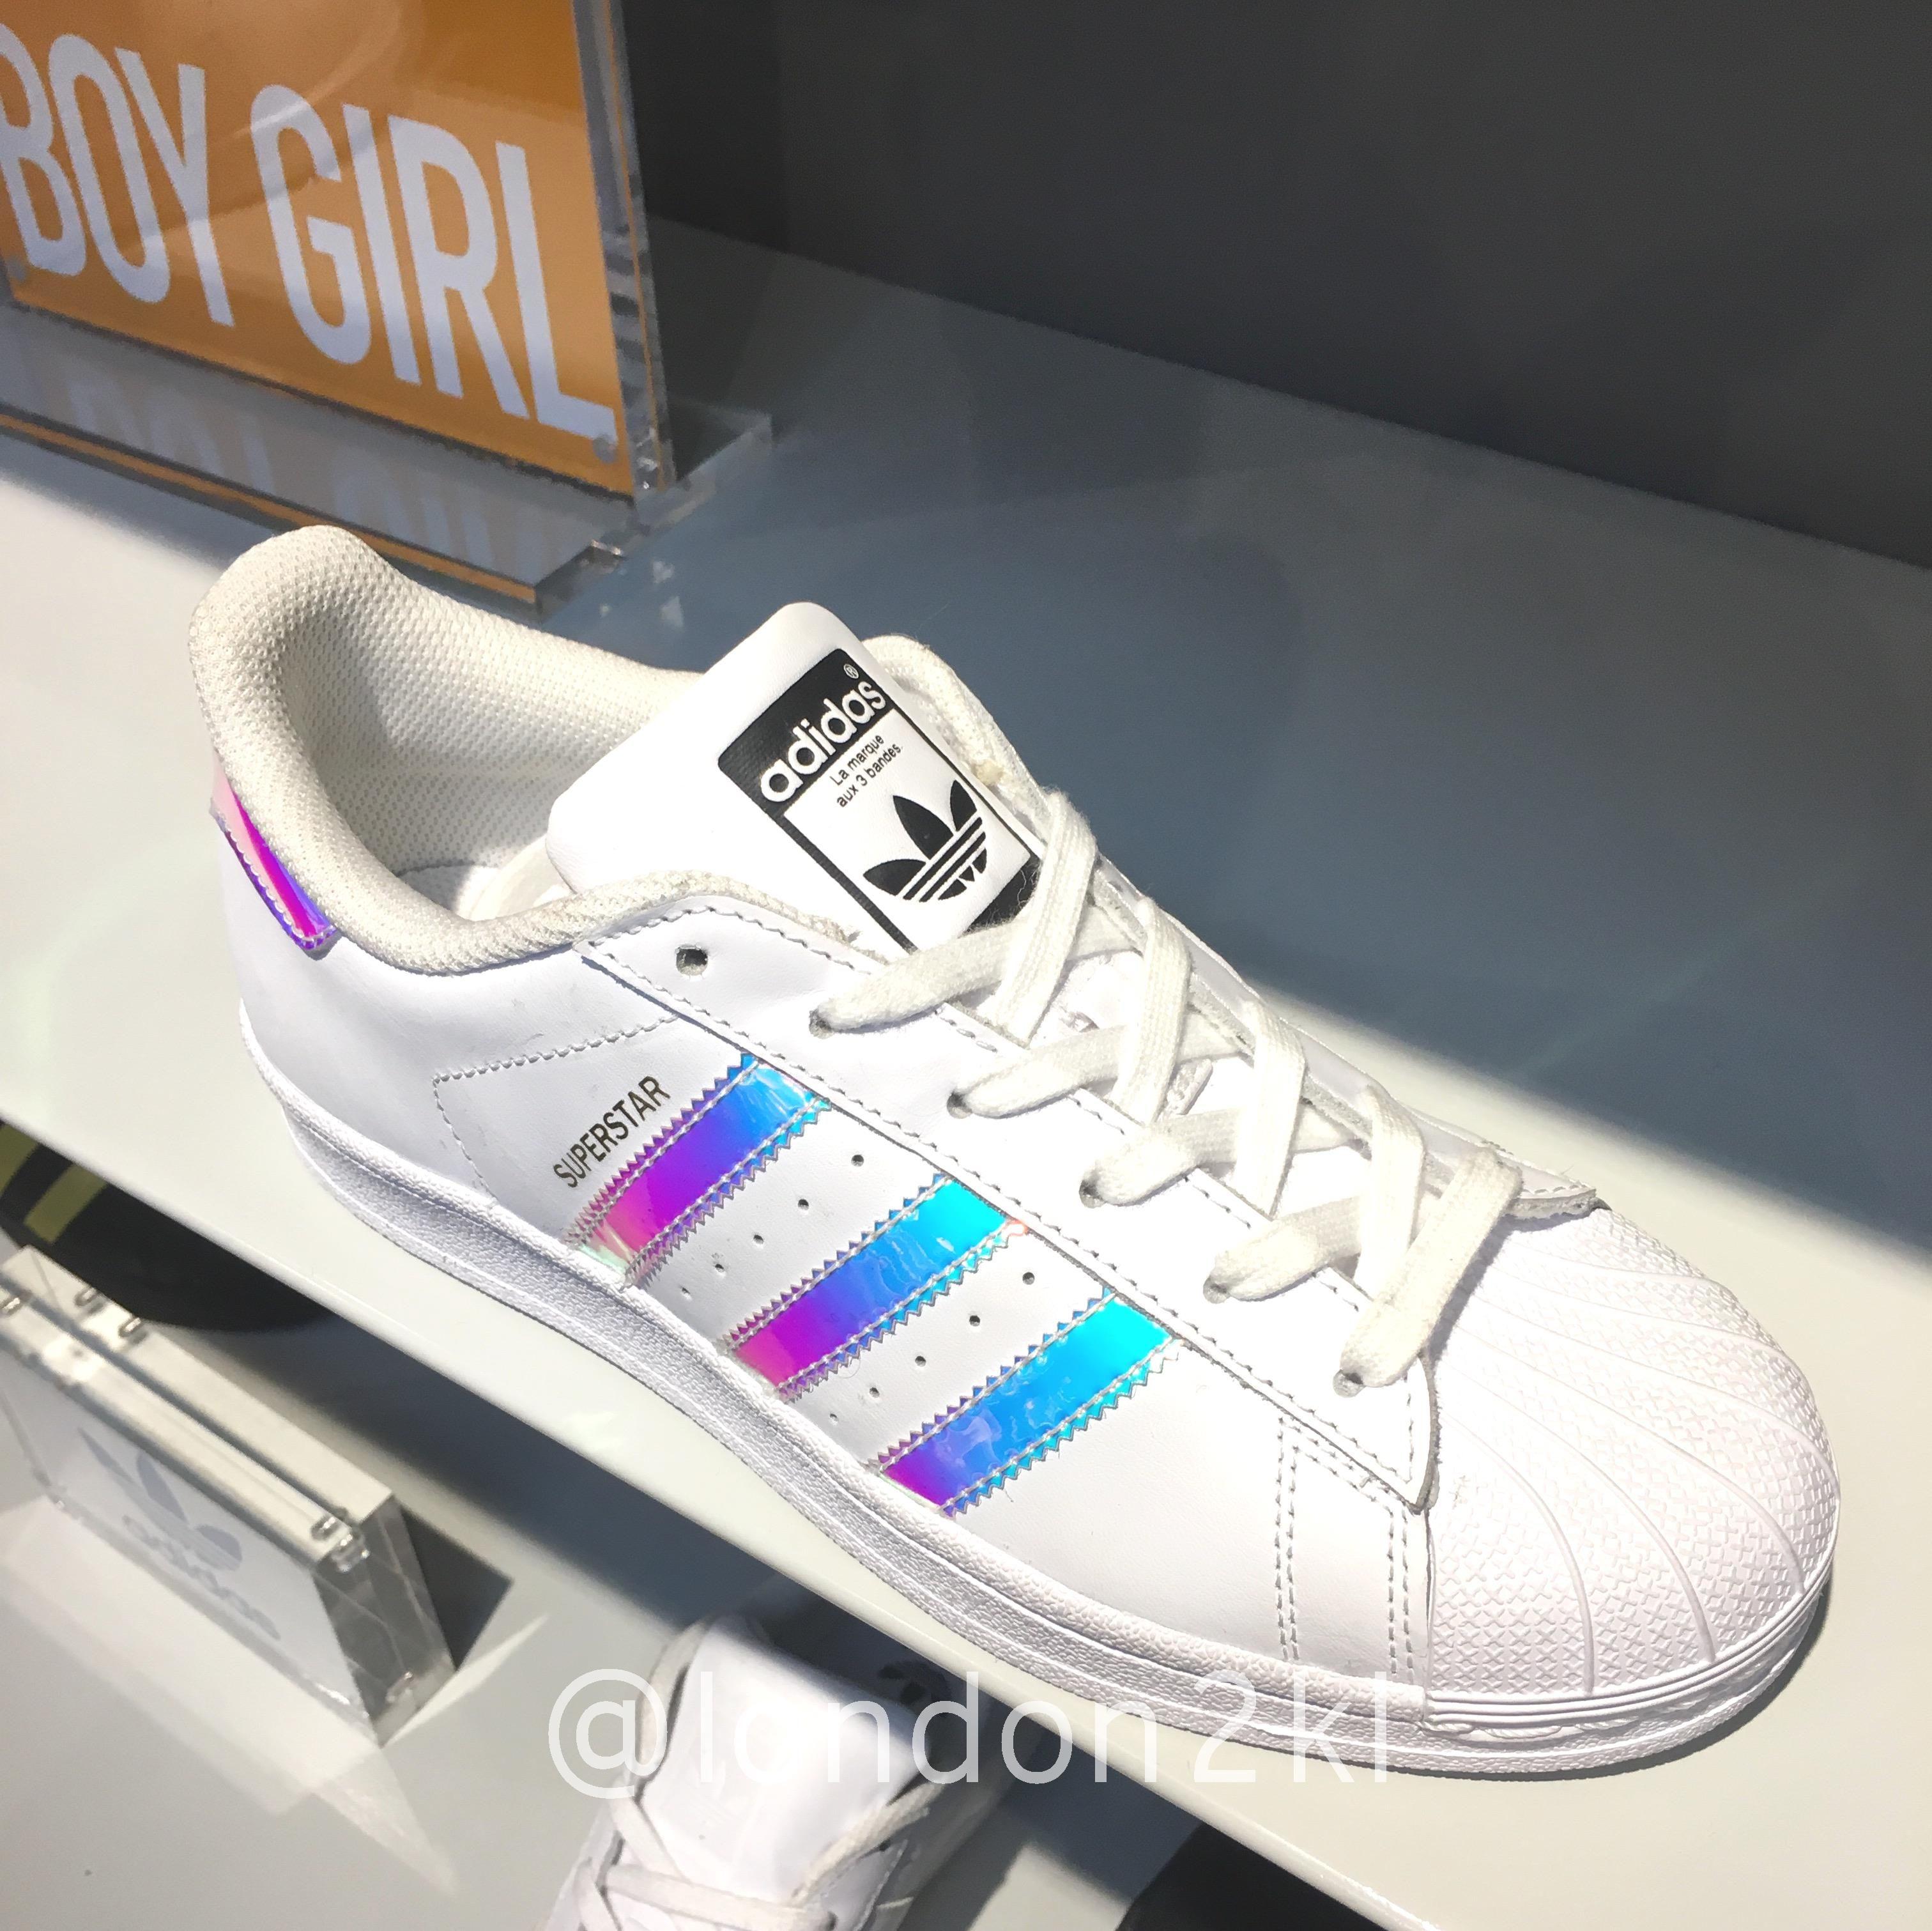 adidas near me now